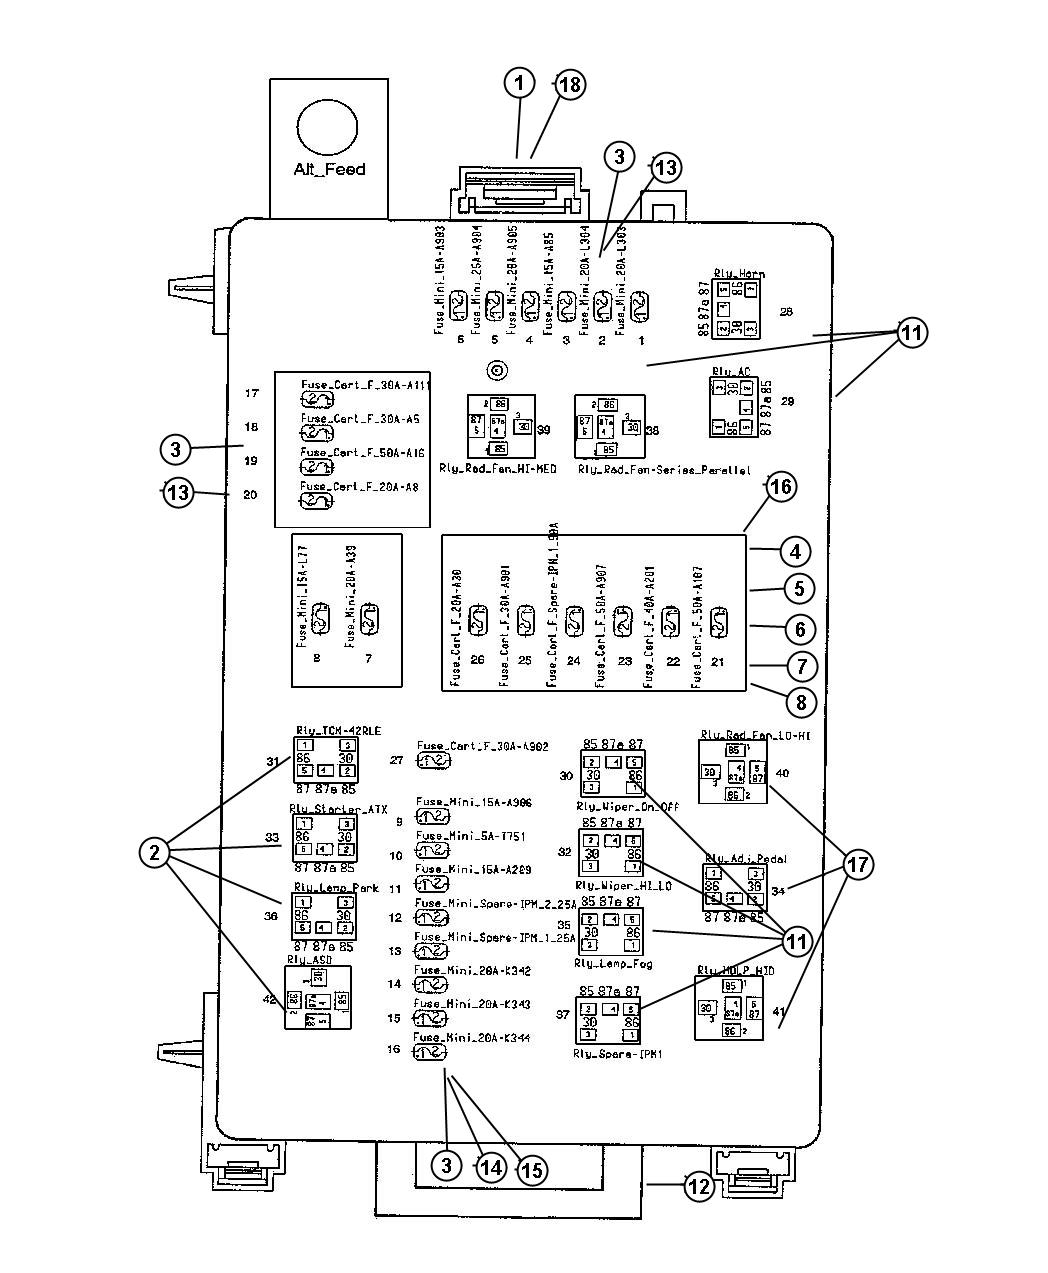 2002 chevy tracker wiring diagram